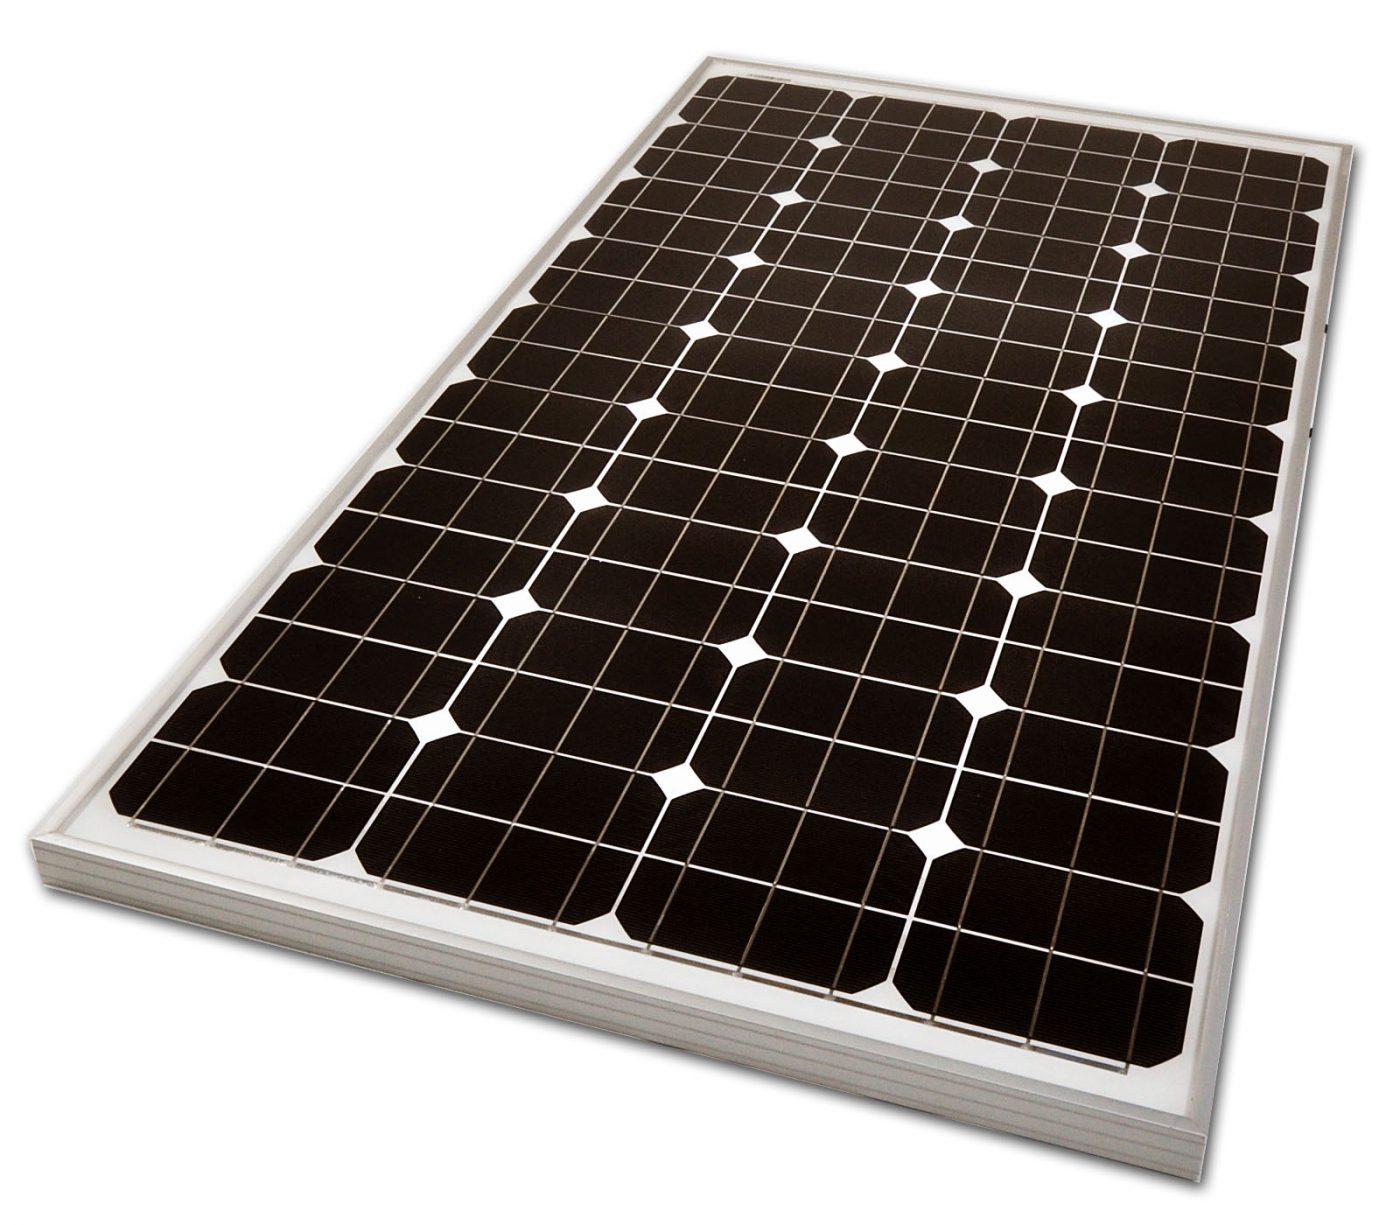 12v 120w solar panel monocrystalline 1150x670 sunstore solar. Black Bedroom Furniture Sets. Home Design Ideas